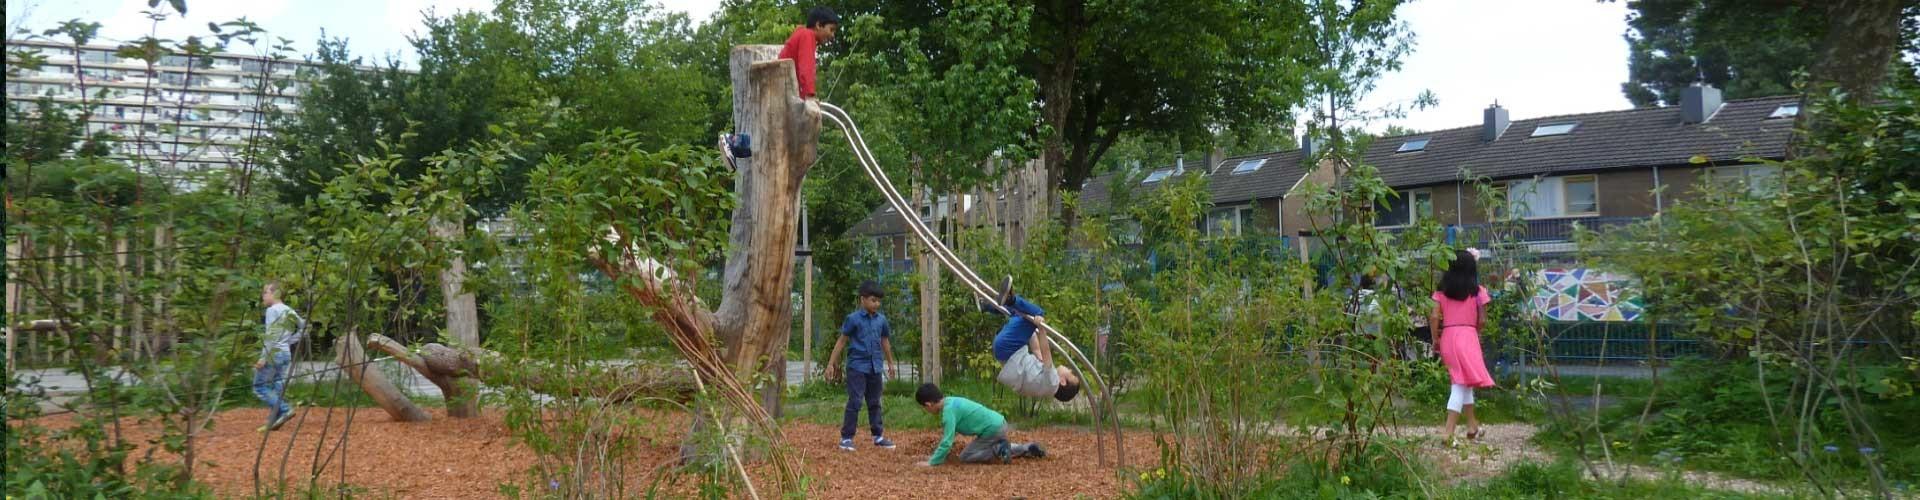 groene schoolpleinen